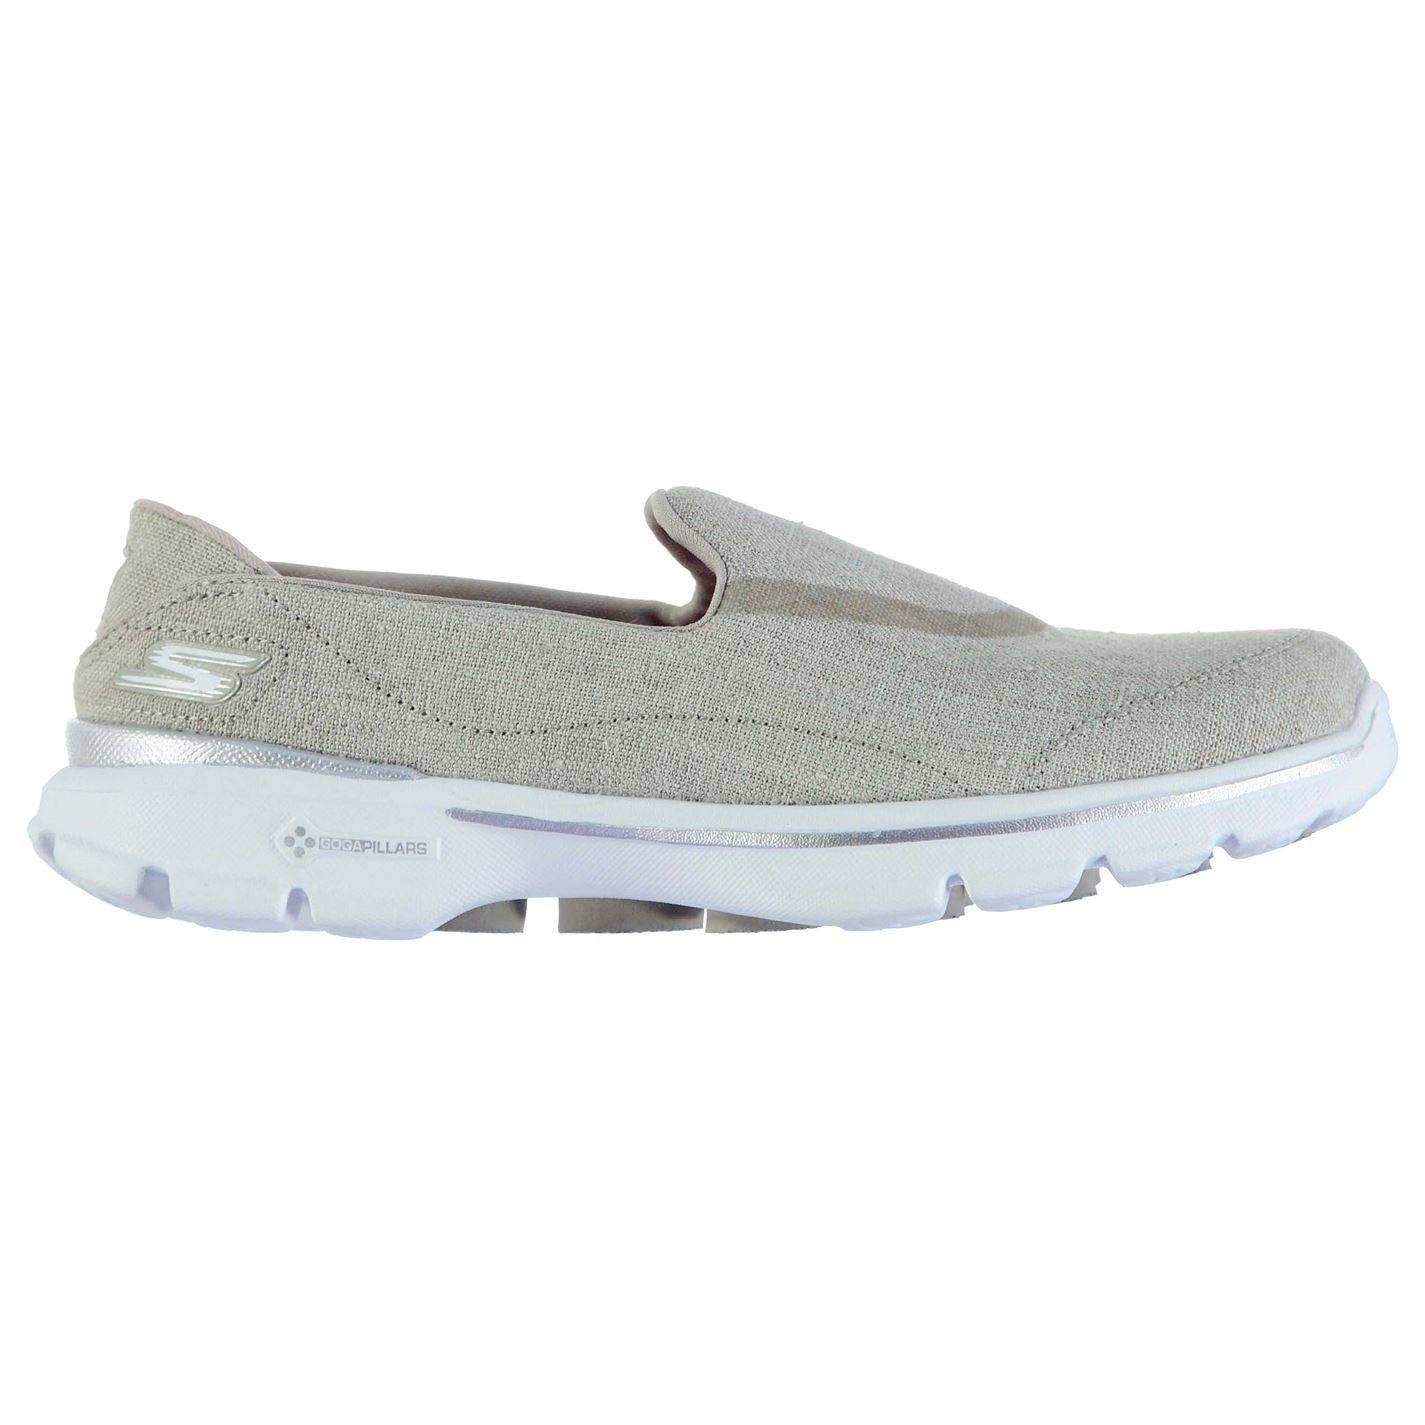 Memory Foam Shoes Sports Direct